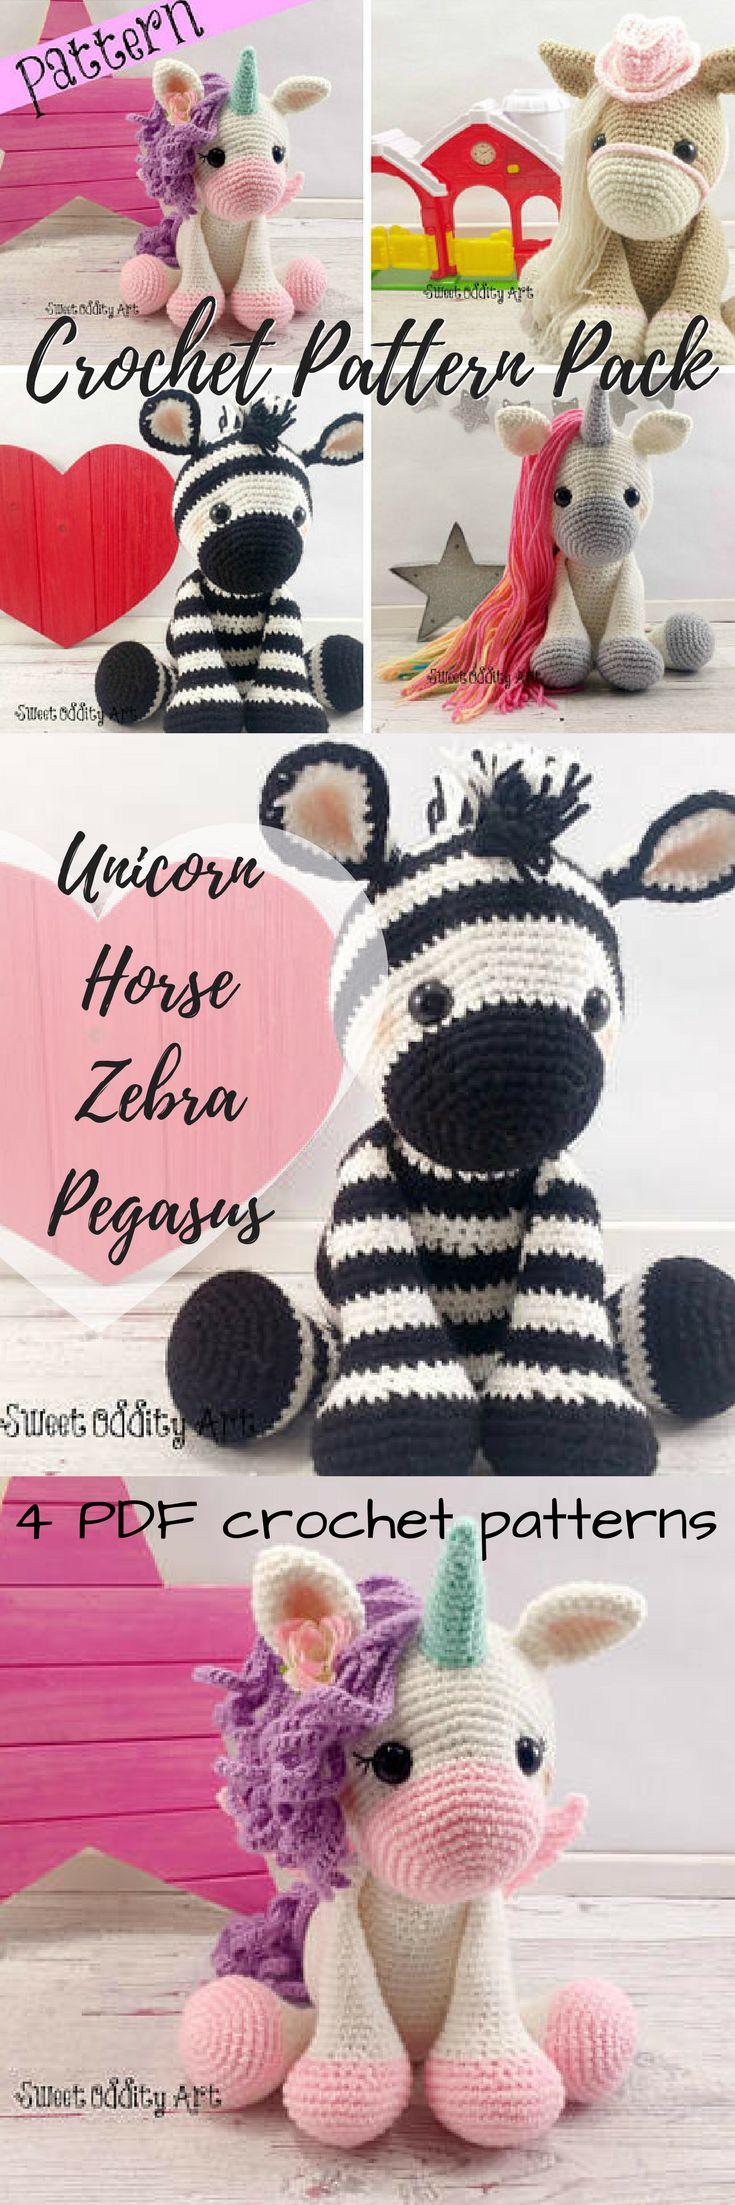 41 best Zebra Crochet Patterns images on Pinterest | Amigurumi ...